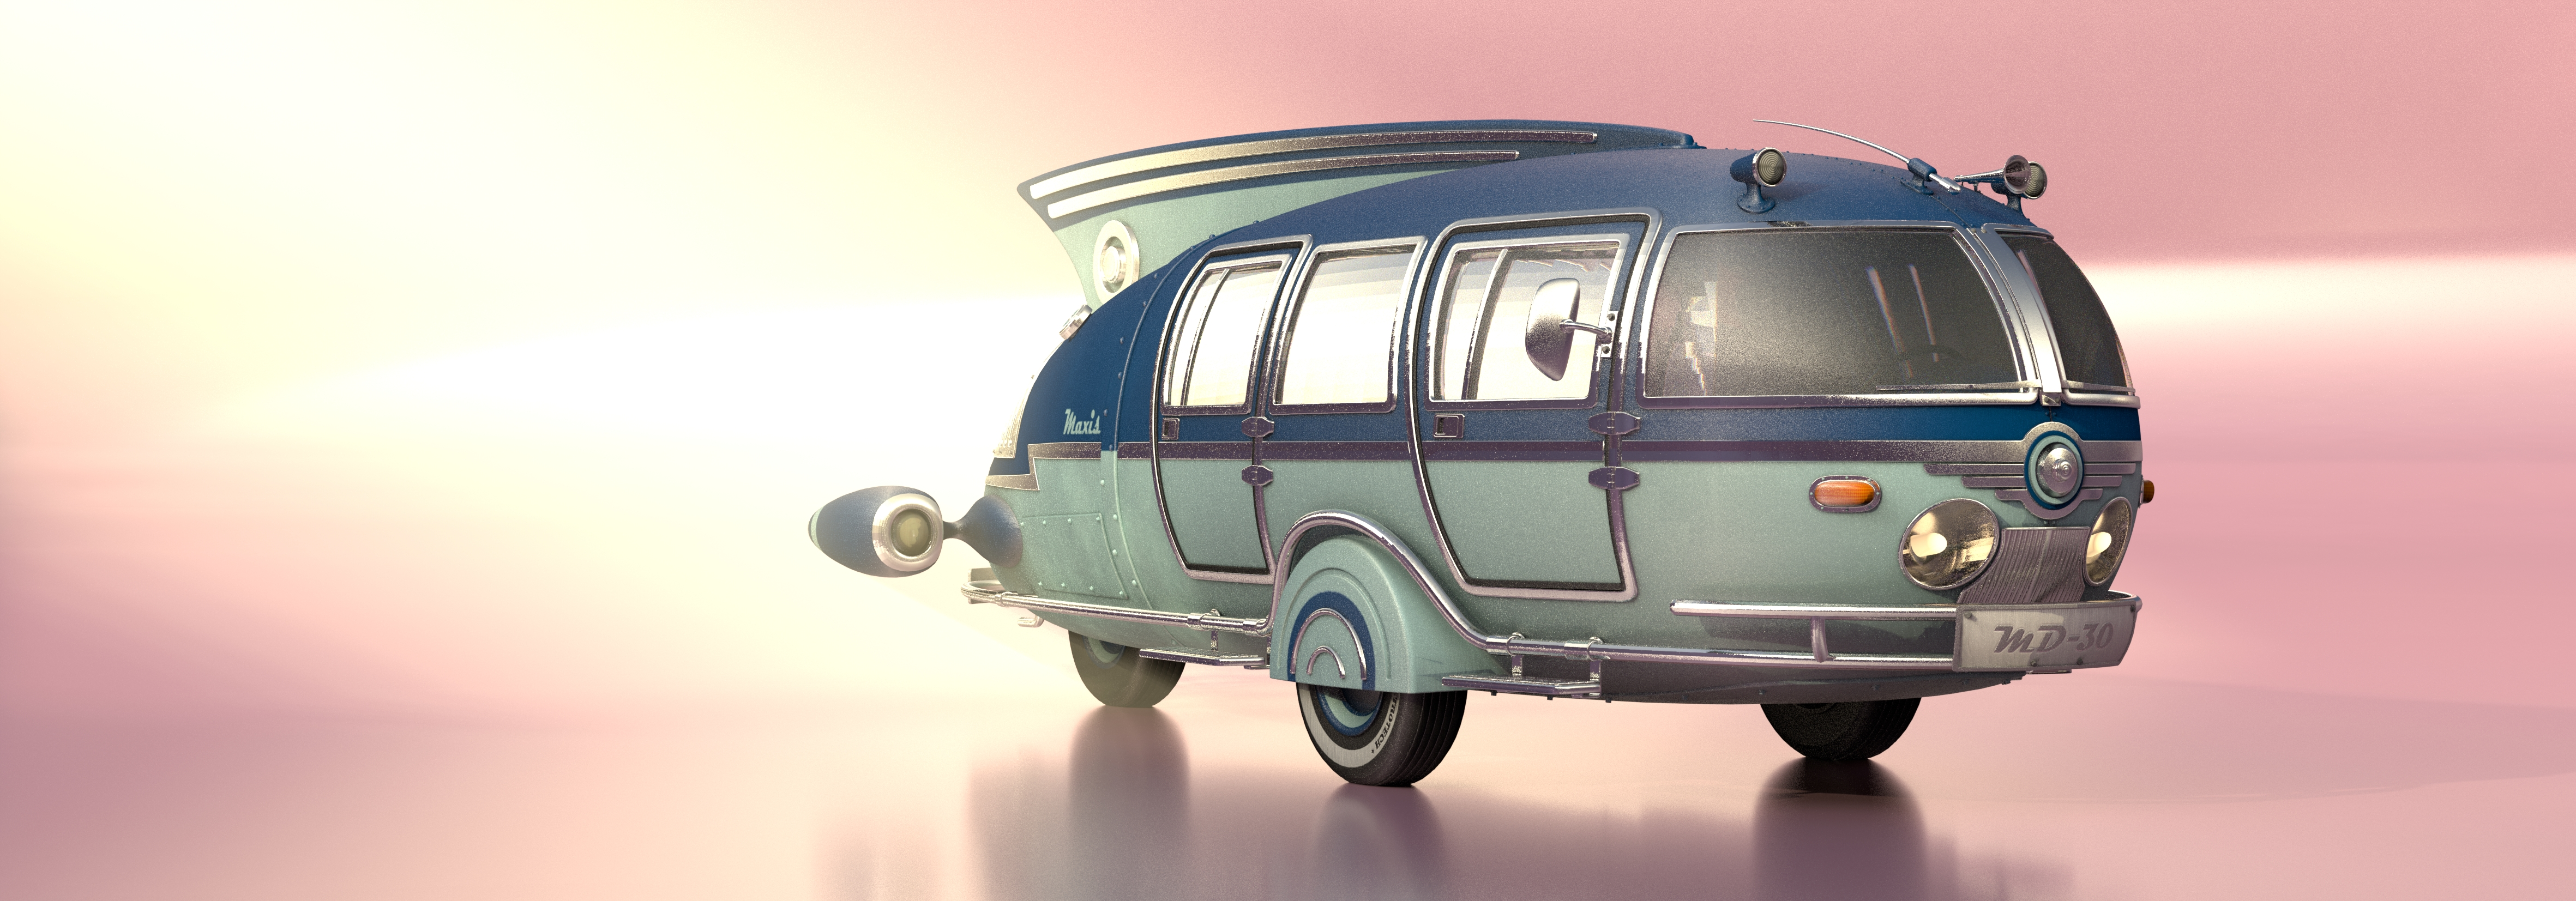 MAXIS CAR-V2